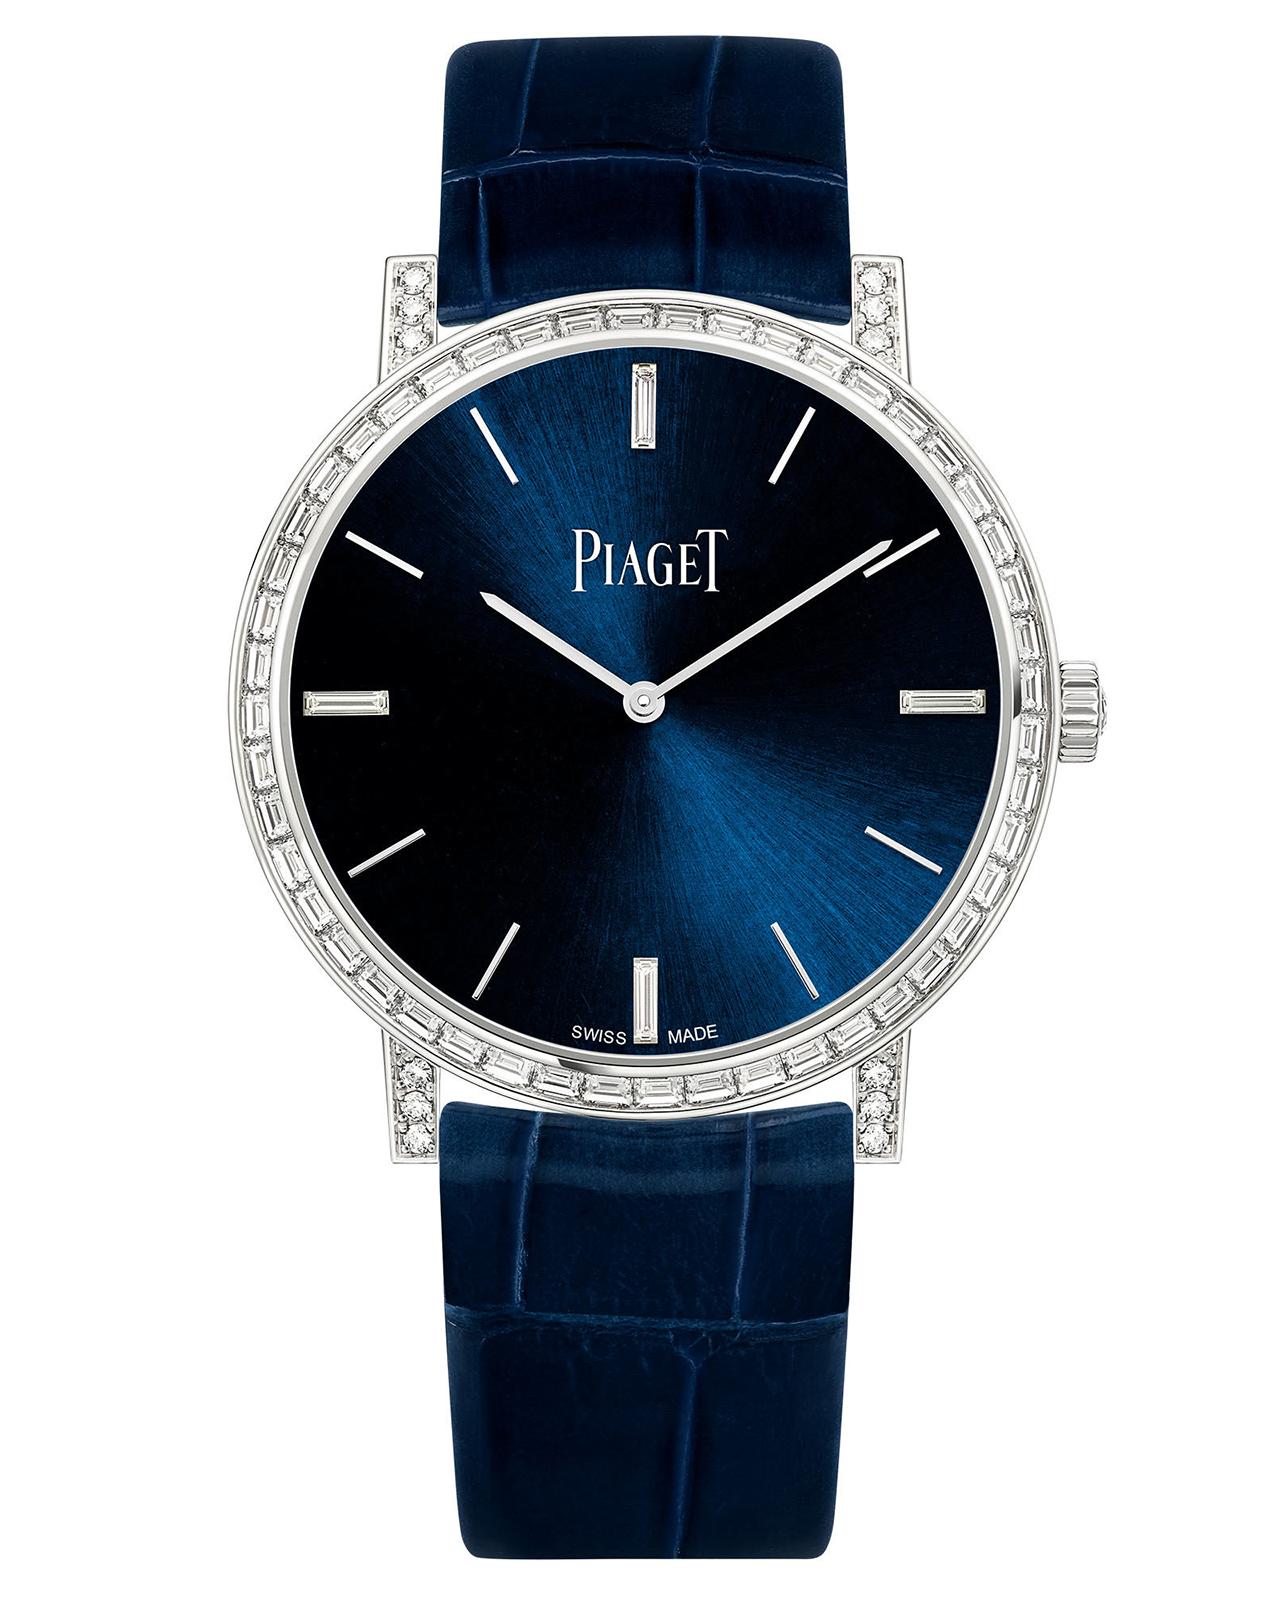 Piaget Altiplano Baguette-Cut Watch